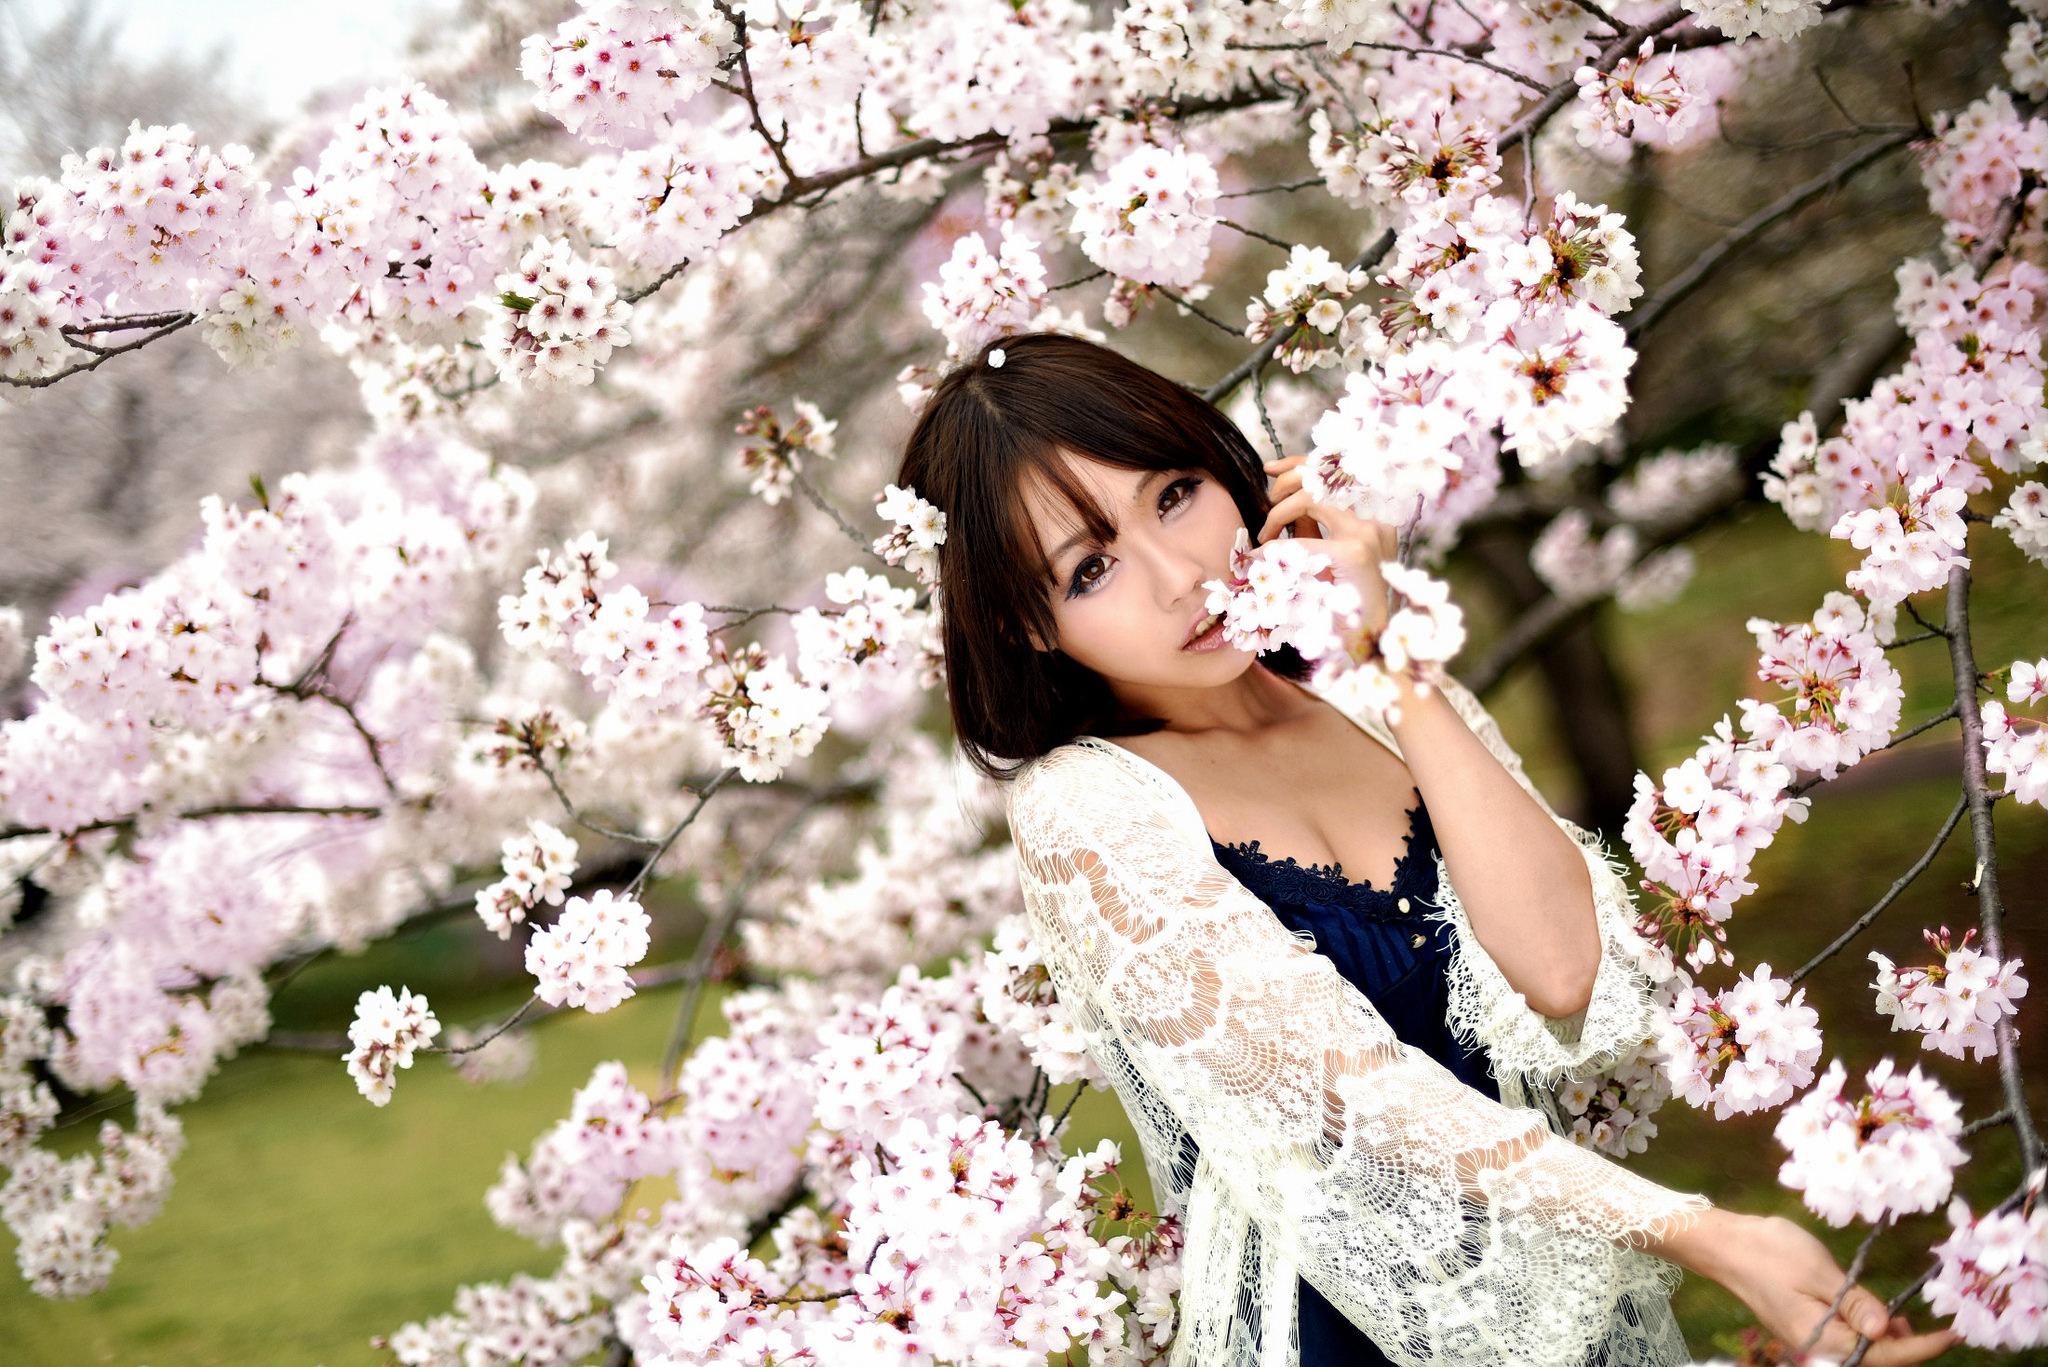 Картинки цветущей сакуры на аву